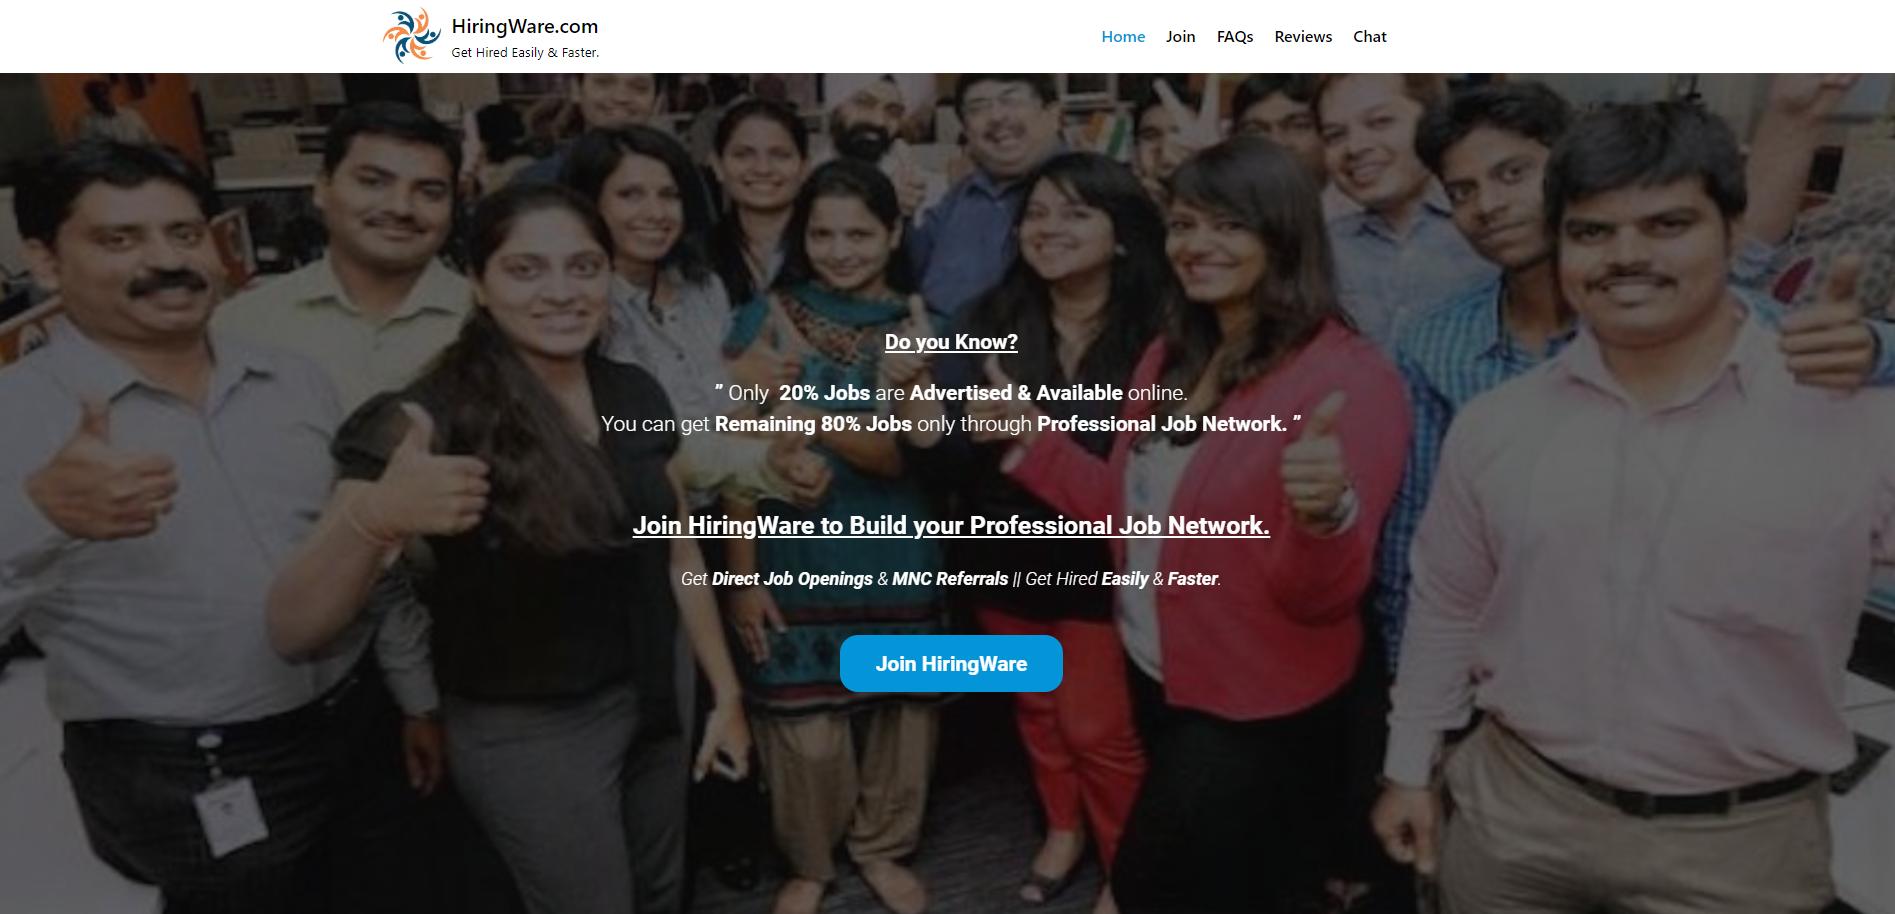 jobacute hiringware scam home page 2